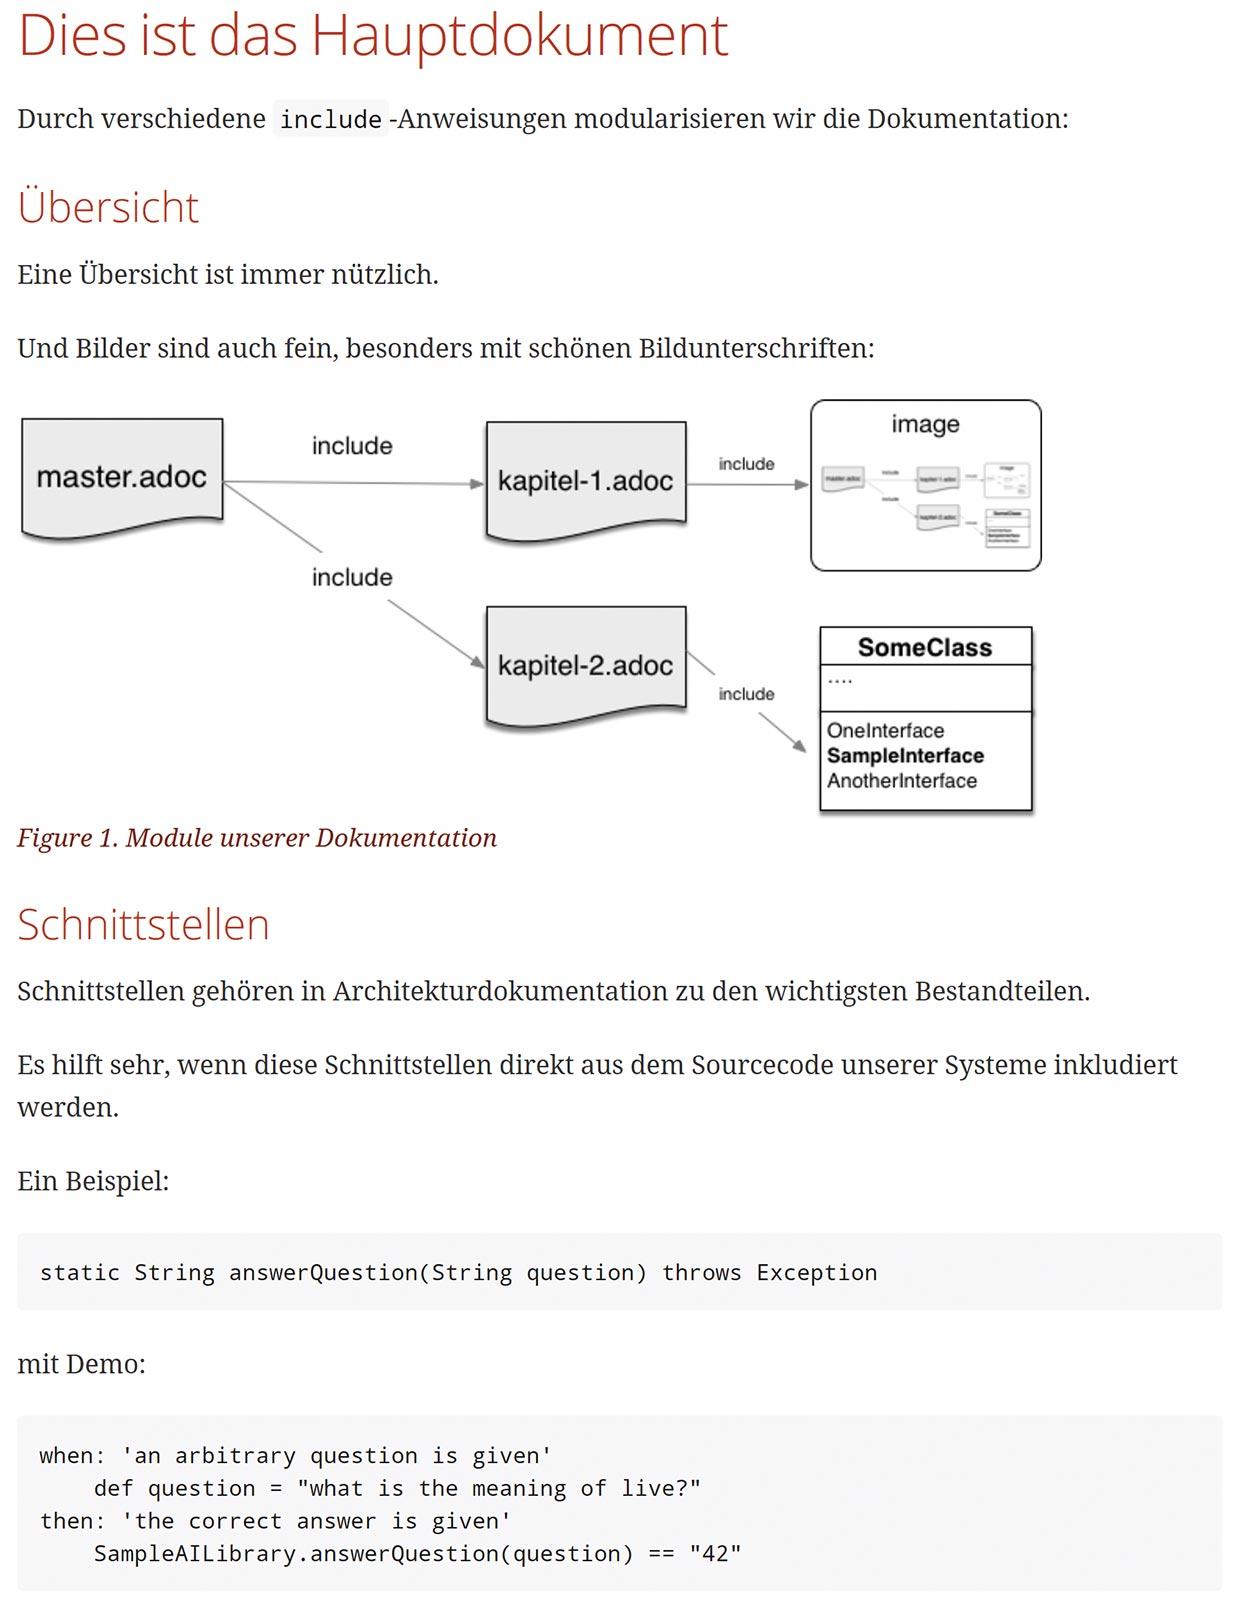 mueller_starke_hhgdac_1.tif_fmt1.jpg